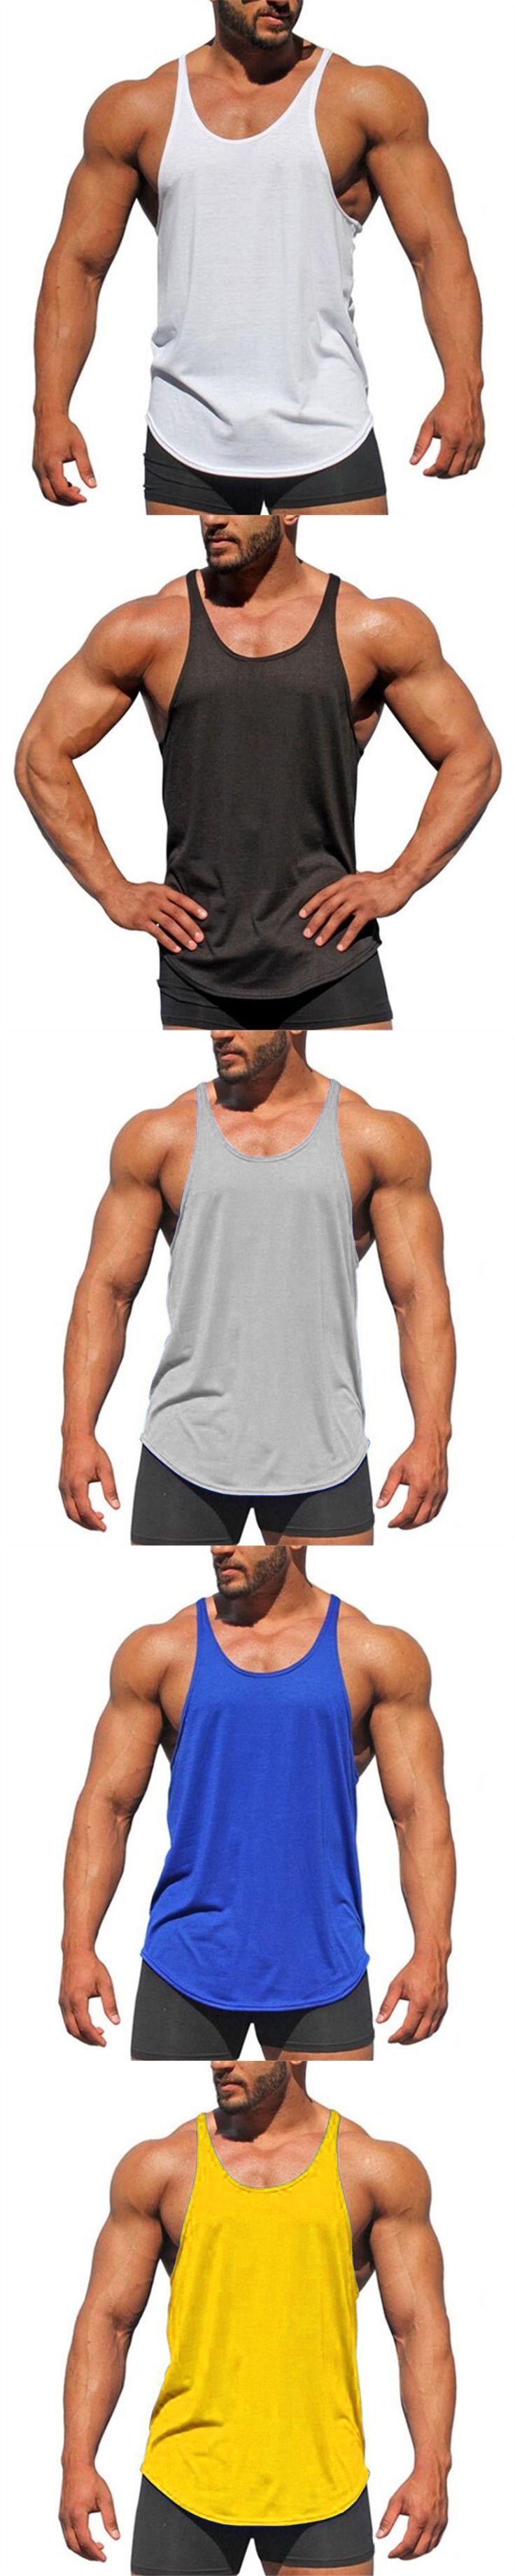 Bodybuilding Tank Top Men's Sleeveless Shirts Brand Clothing Fitness Men Singlet Blank Cotton Workout Stringer Gyms Vest